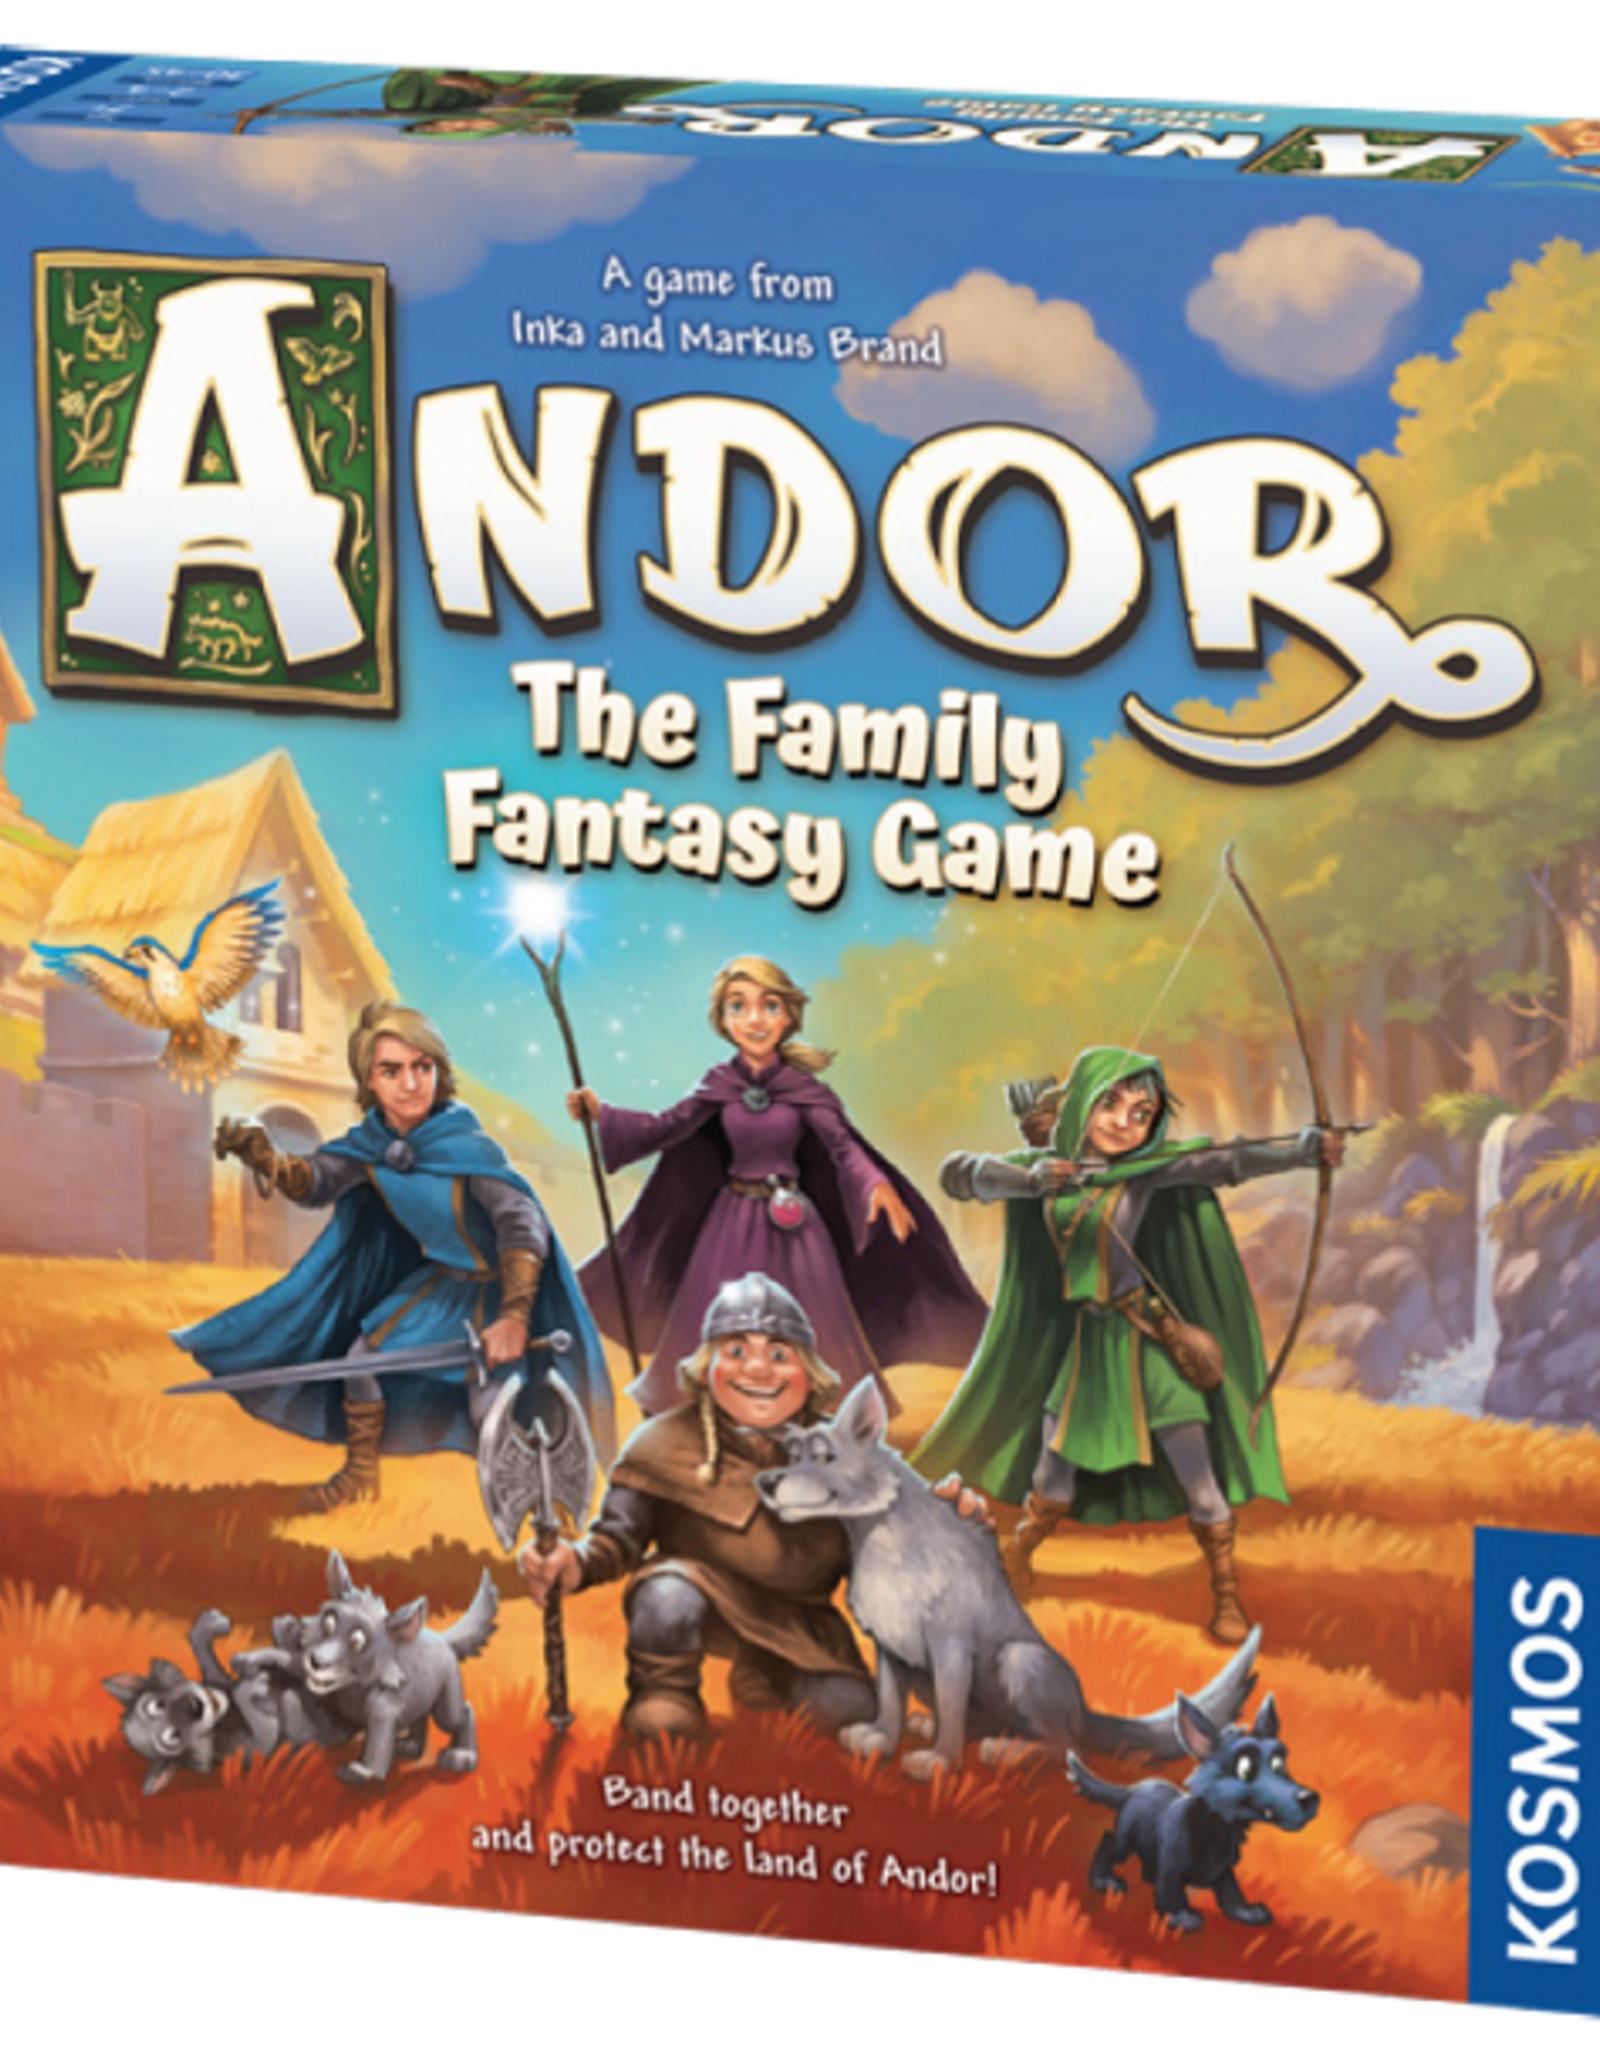 Thames & Kosmos Andor-The Family Fantasy Game